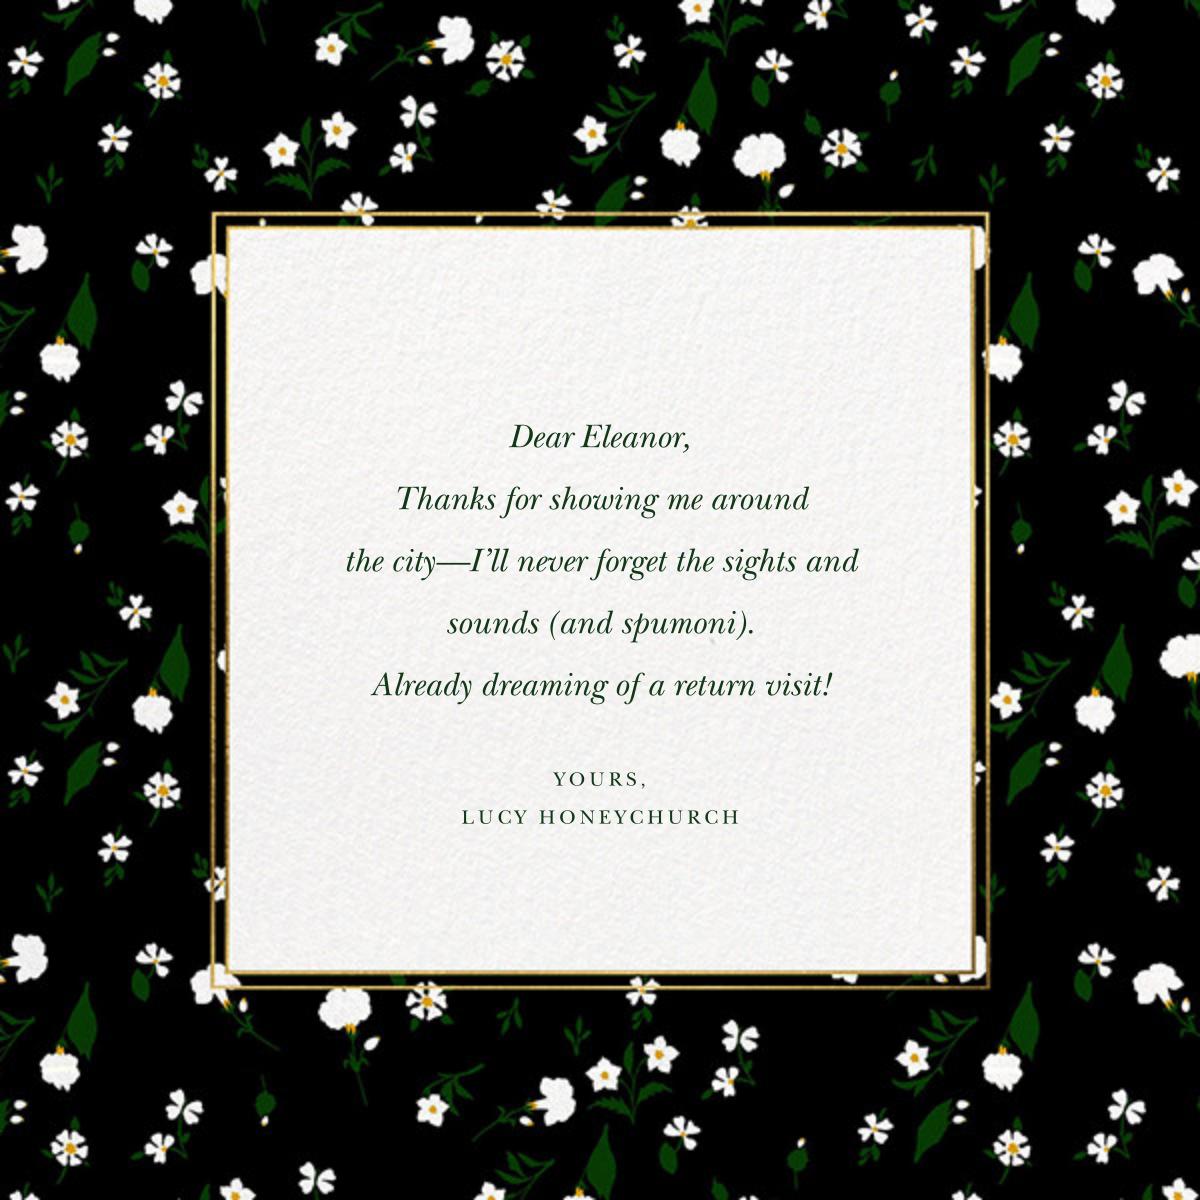 Tossed Daisies - Oscar de la Renta - Thank you